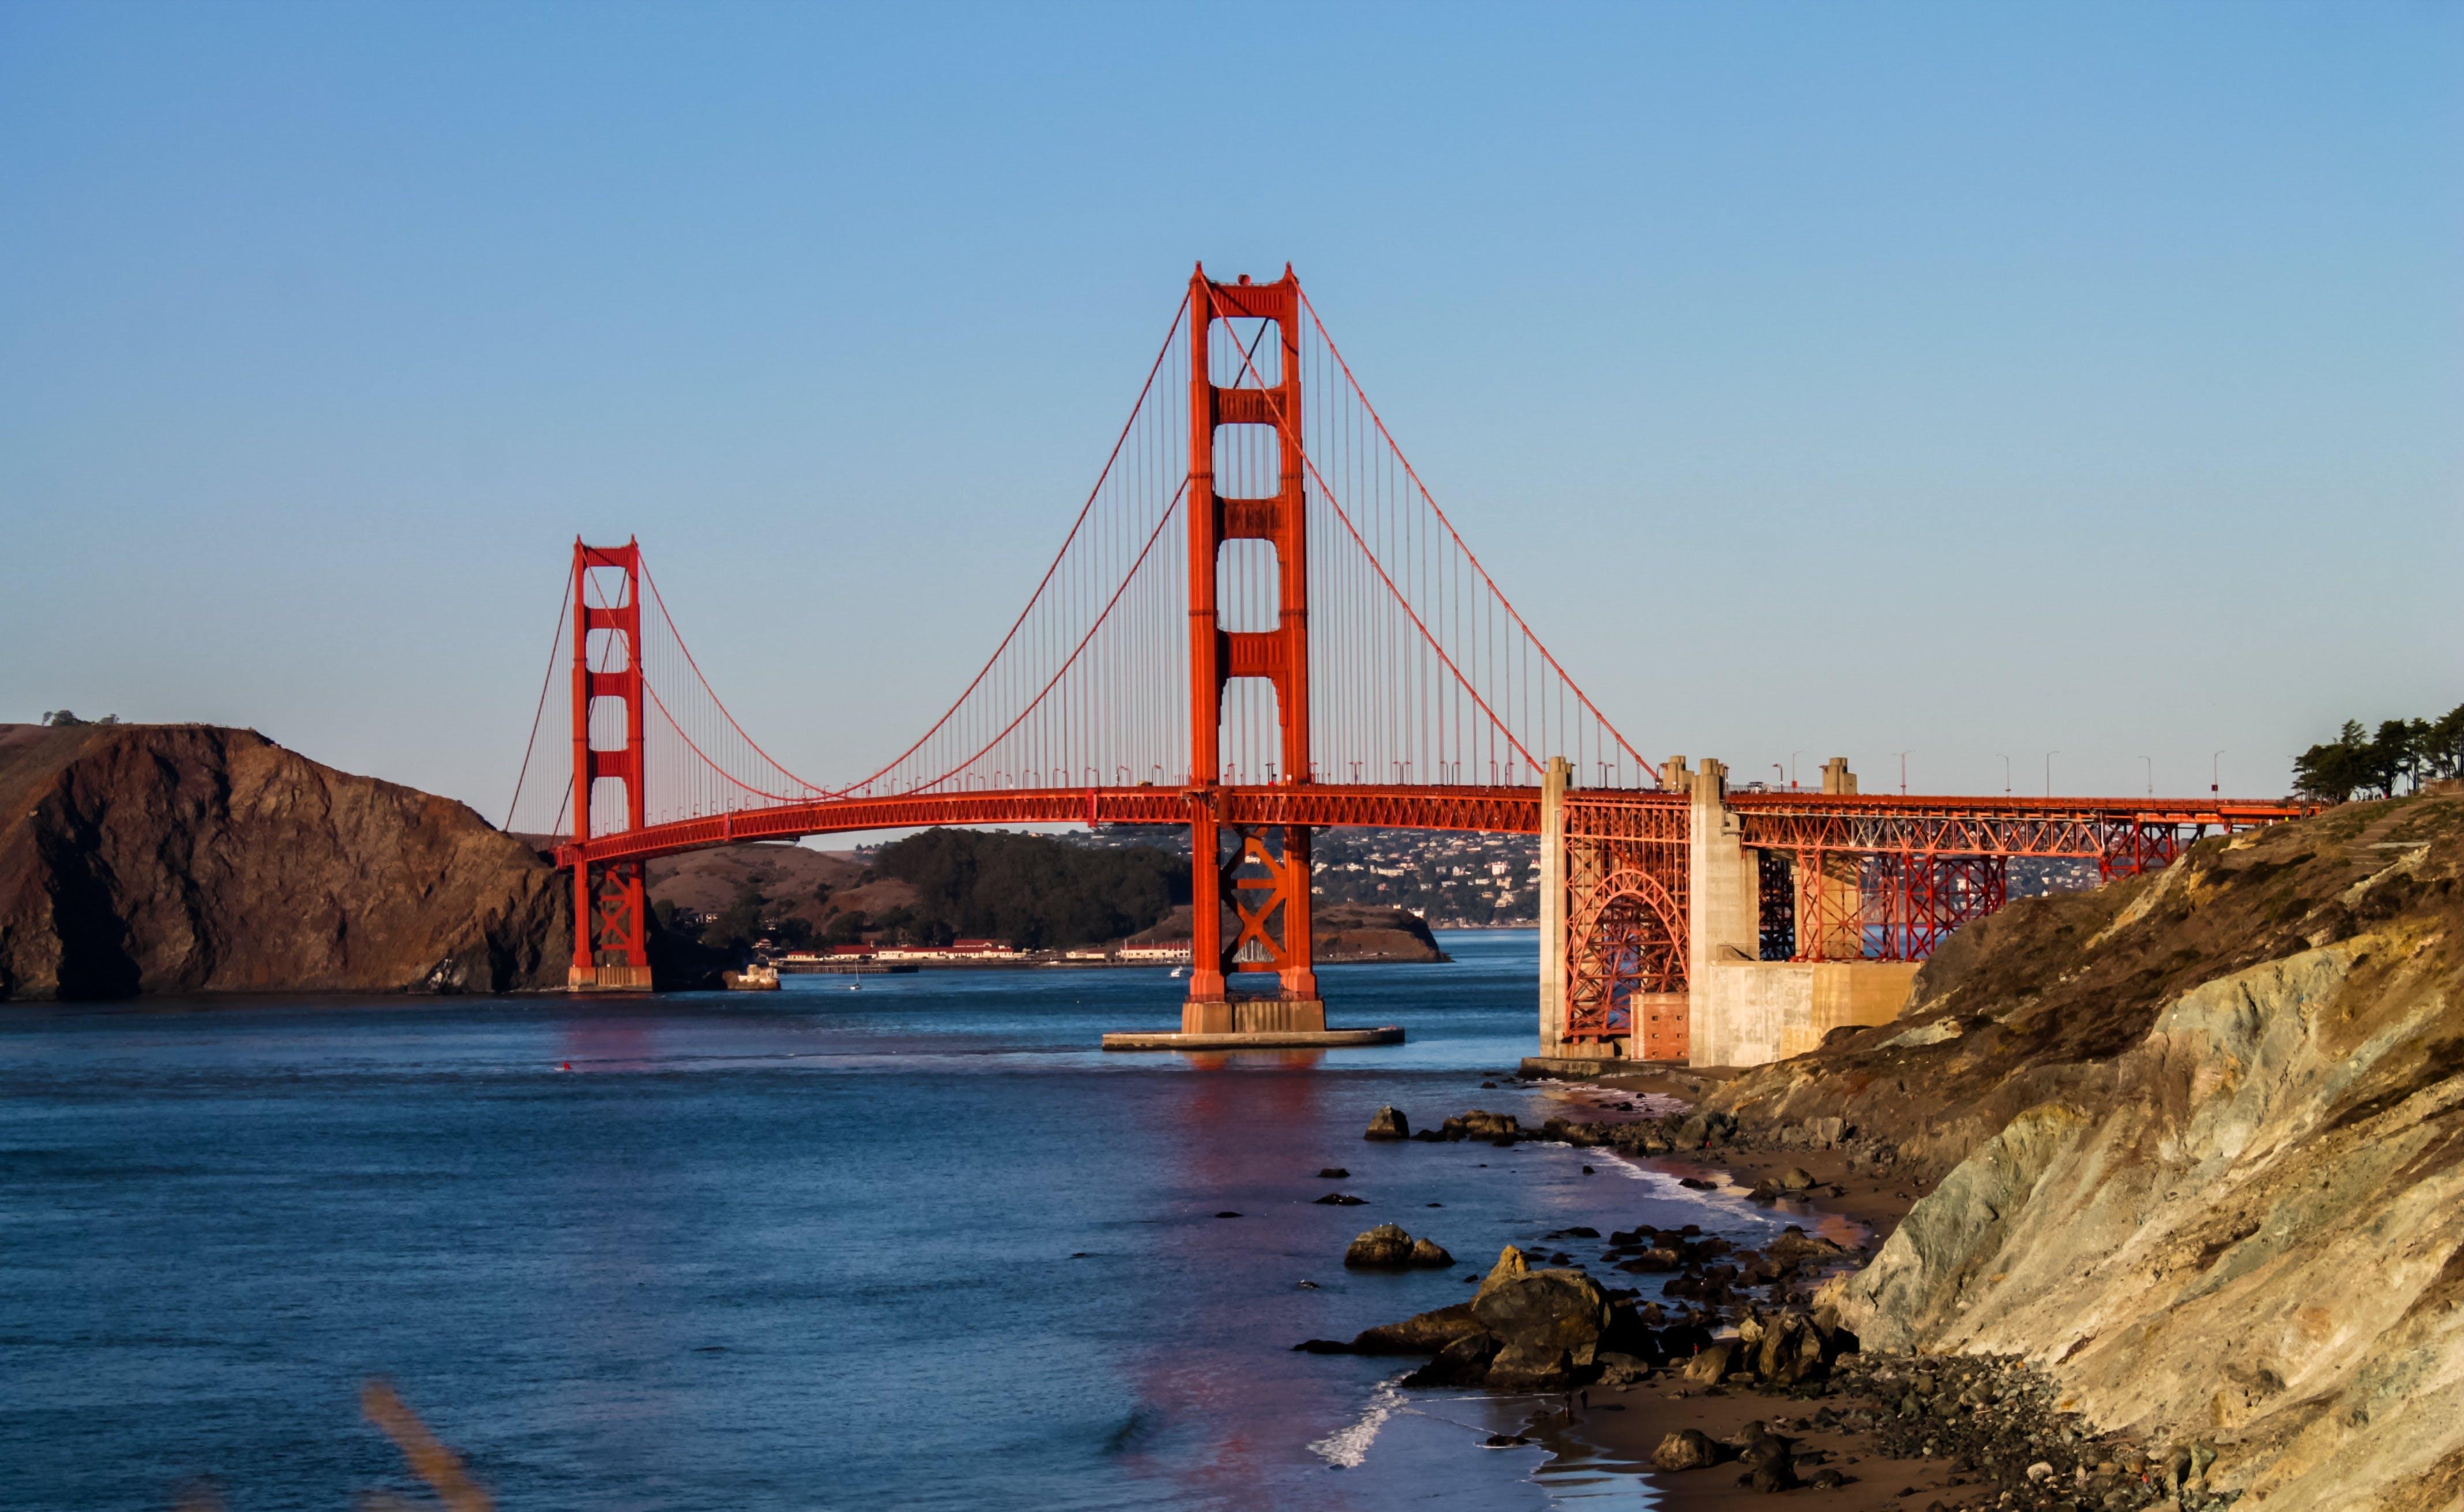 Photography of Bridge on Body of Water